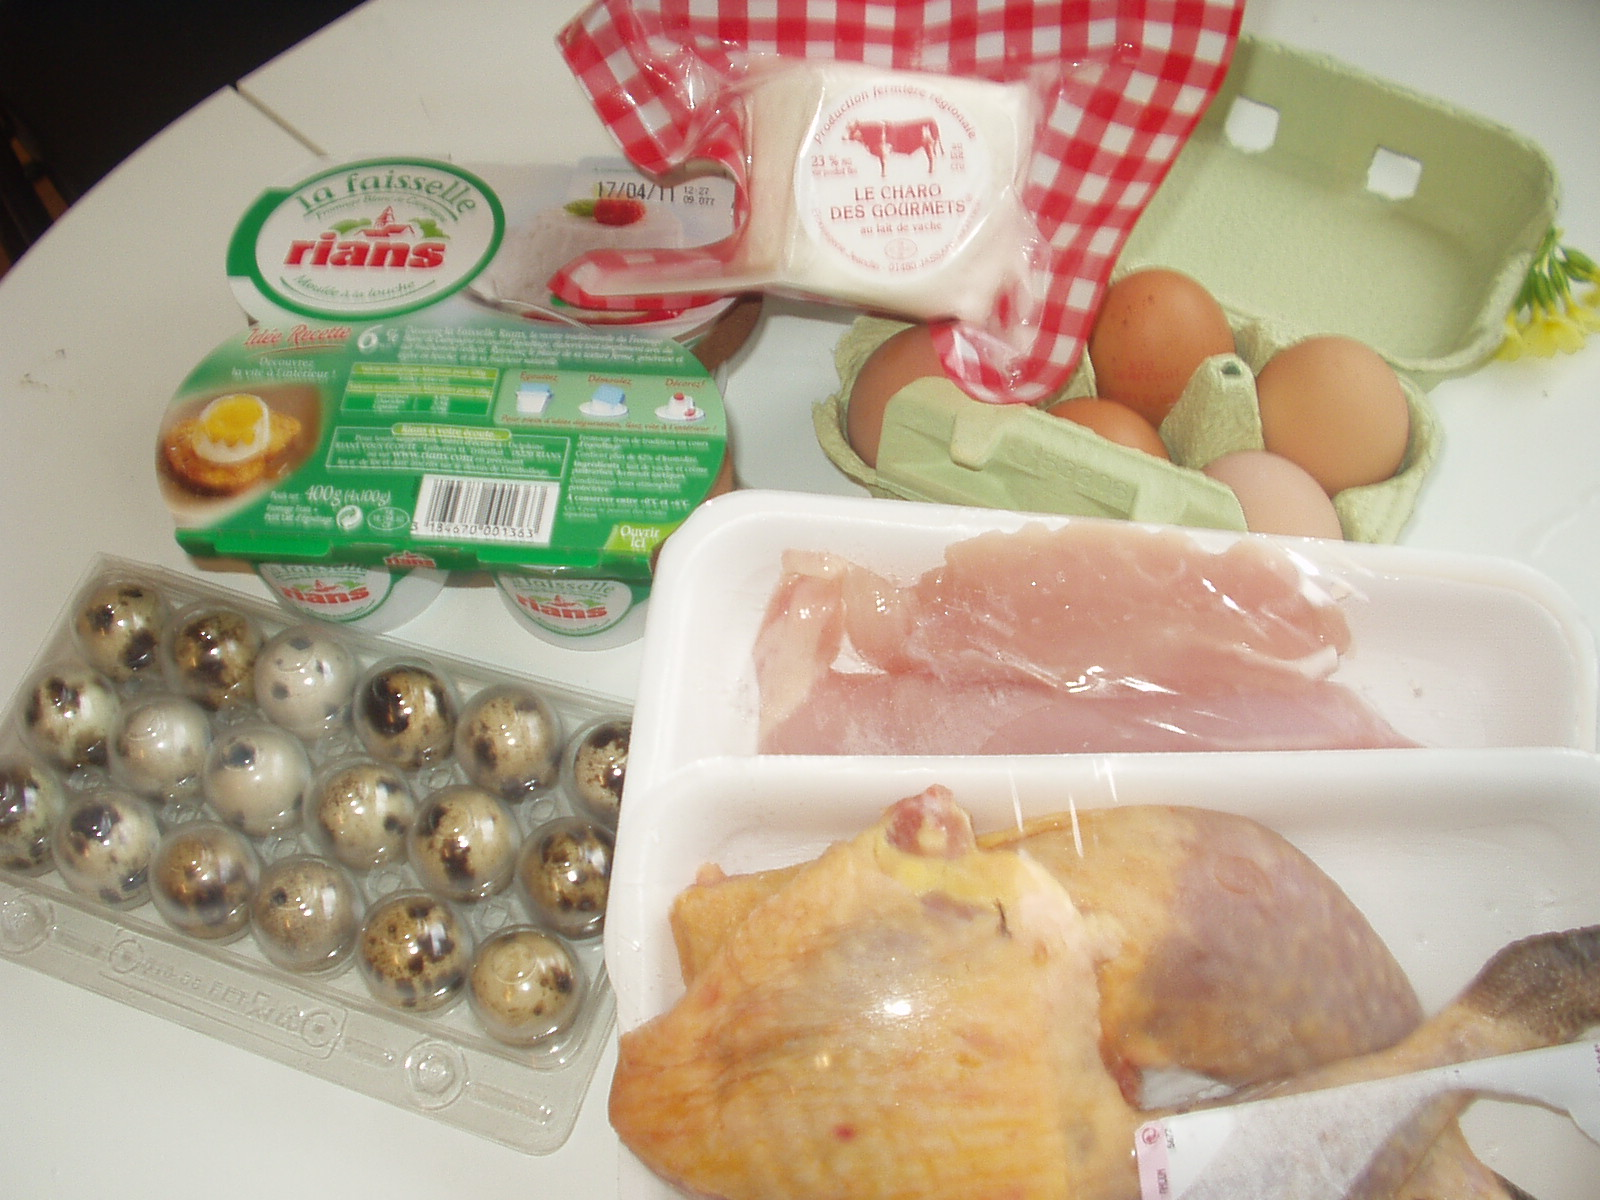 Pancake Day Dieta Dukan, Saiba Tudo! / Toute l'actualité mode et beauté en